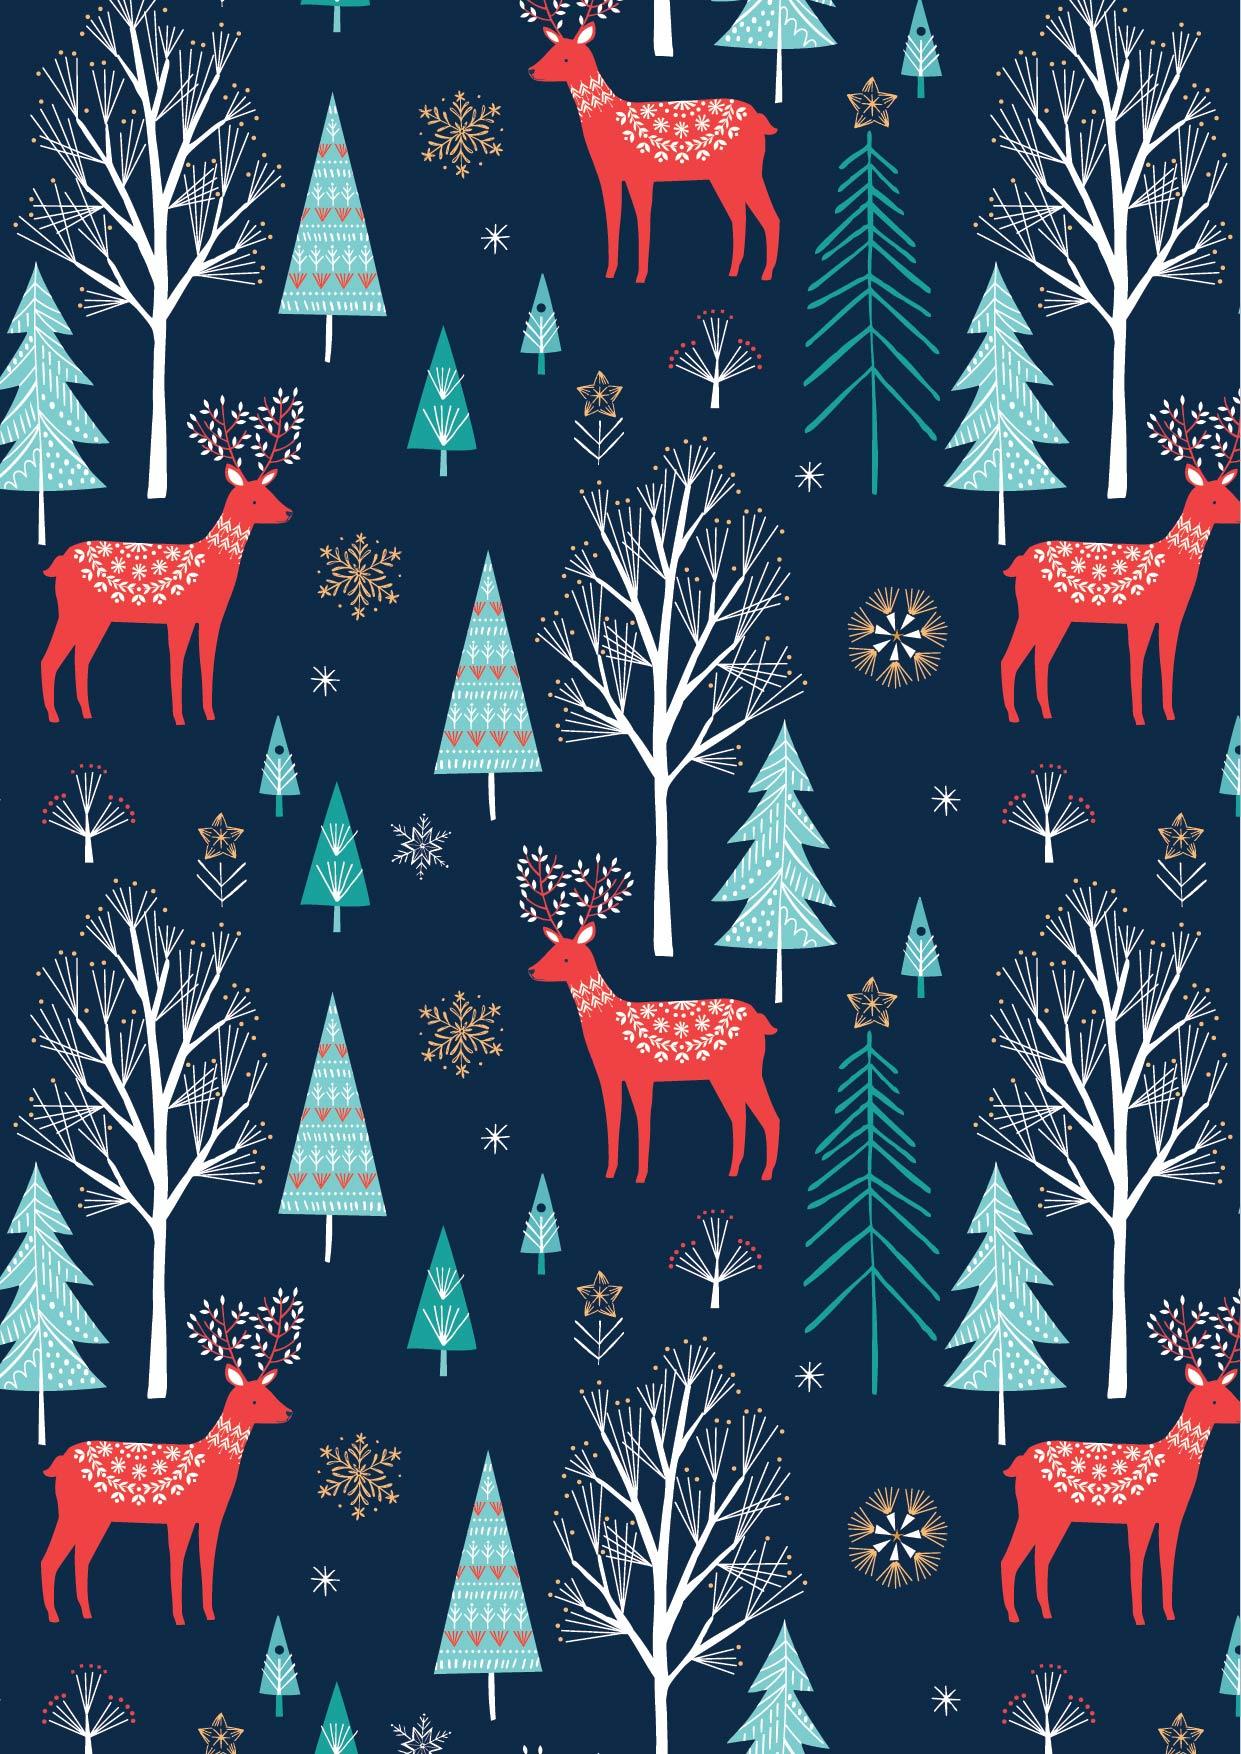 Deer in Navy by Bethan Janine from the Skogen collection for Dashwood Studio #SKOG1528